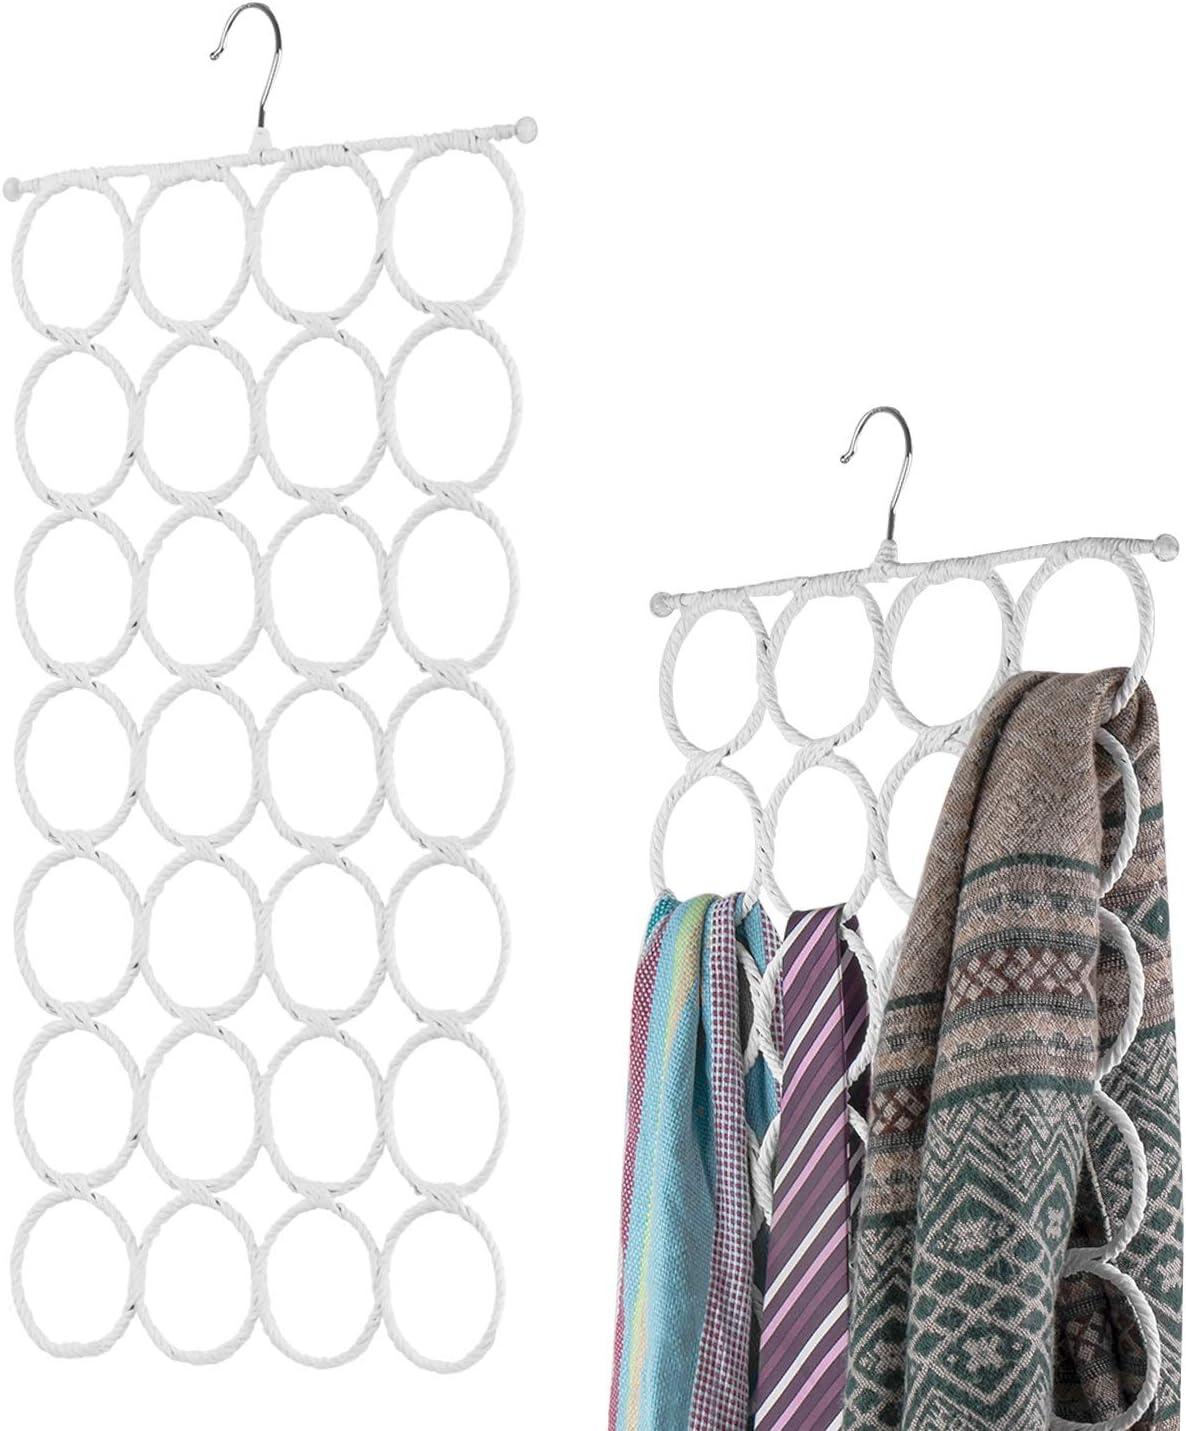 Flexzion Scarf Hanger Holder - (2 Pack, White) 28 Count Circles/Ring Slots Multifunctional Hanging Rack, Home Organizer, for Socks Scarf Ties Belt Mufflers Shawl/Door Closet Organization